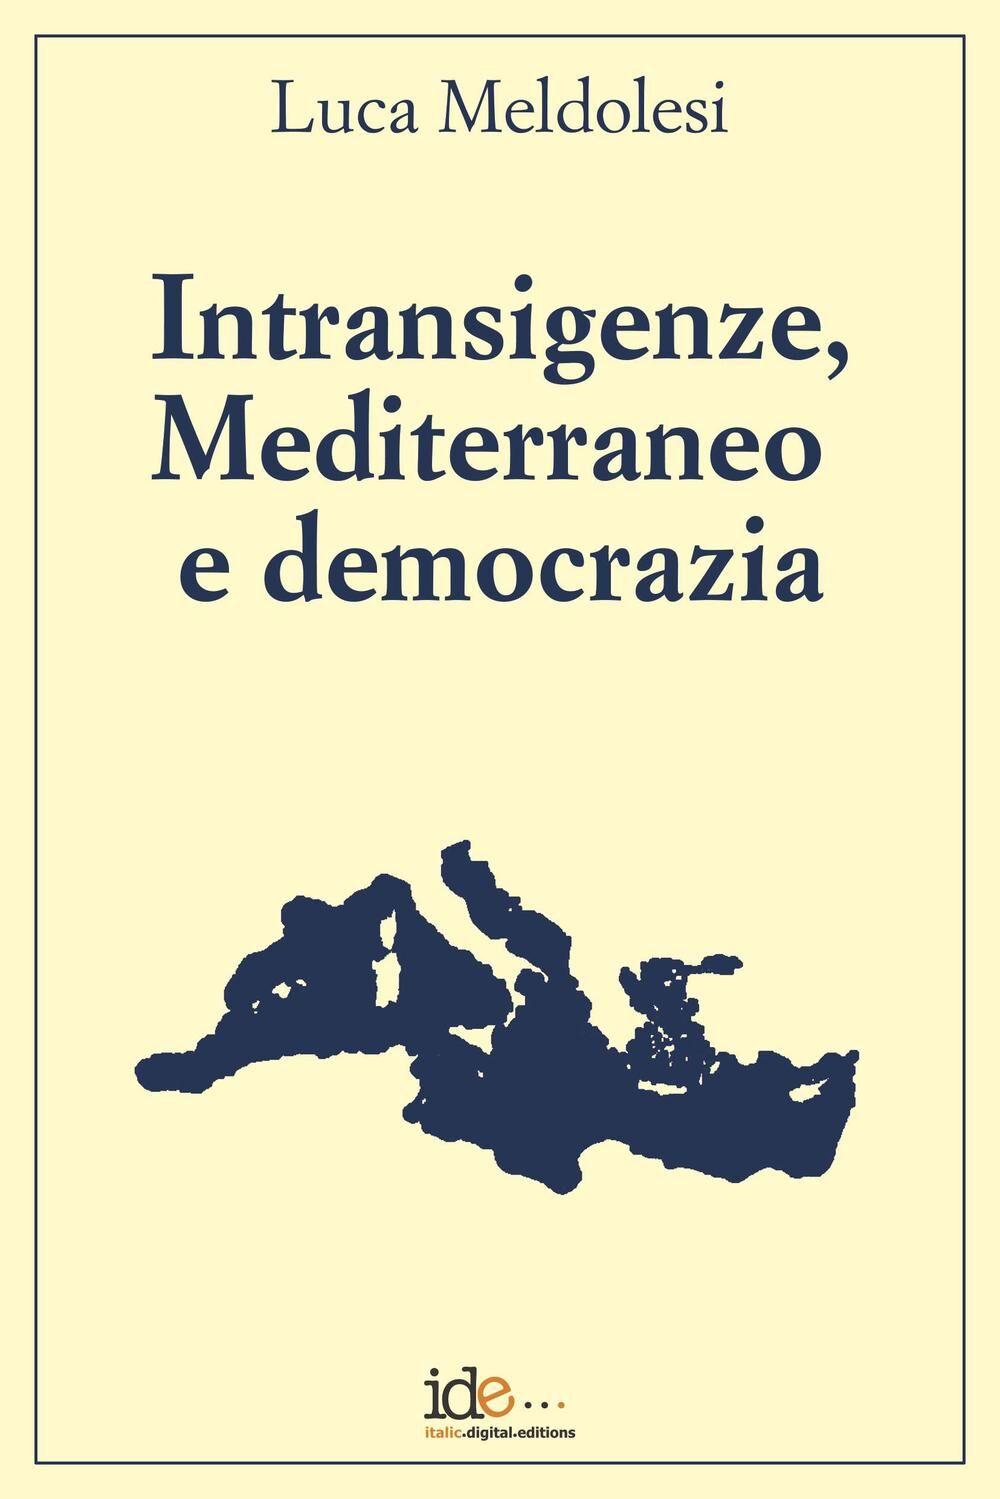 Intransigenze, mediterraneo e democrazia